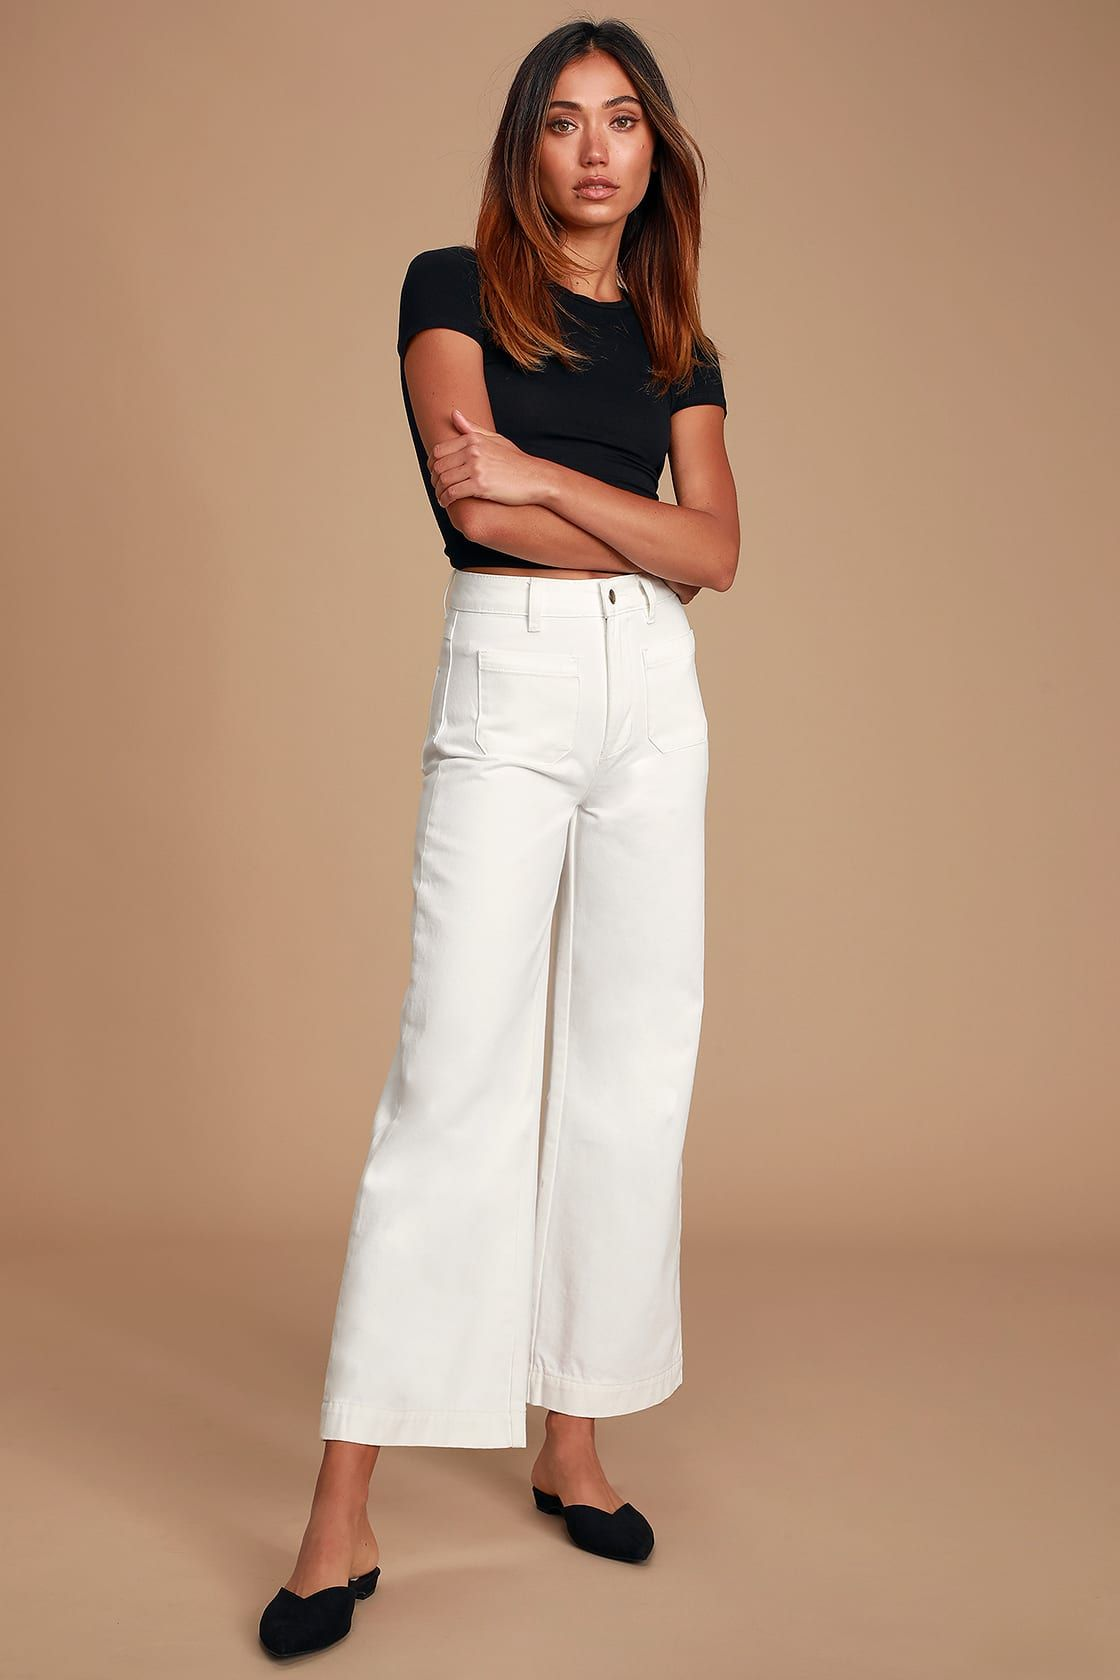 1980s high waist denim wide leg culottes trousers pants 28 waist Cropped Palazzo jeans